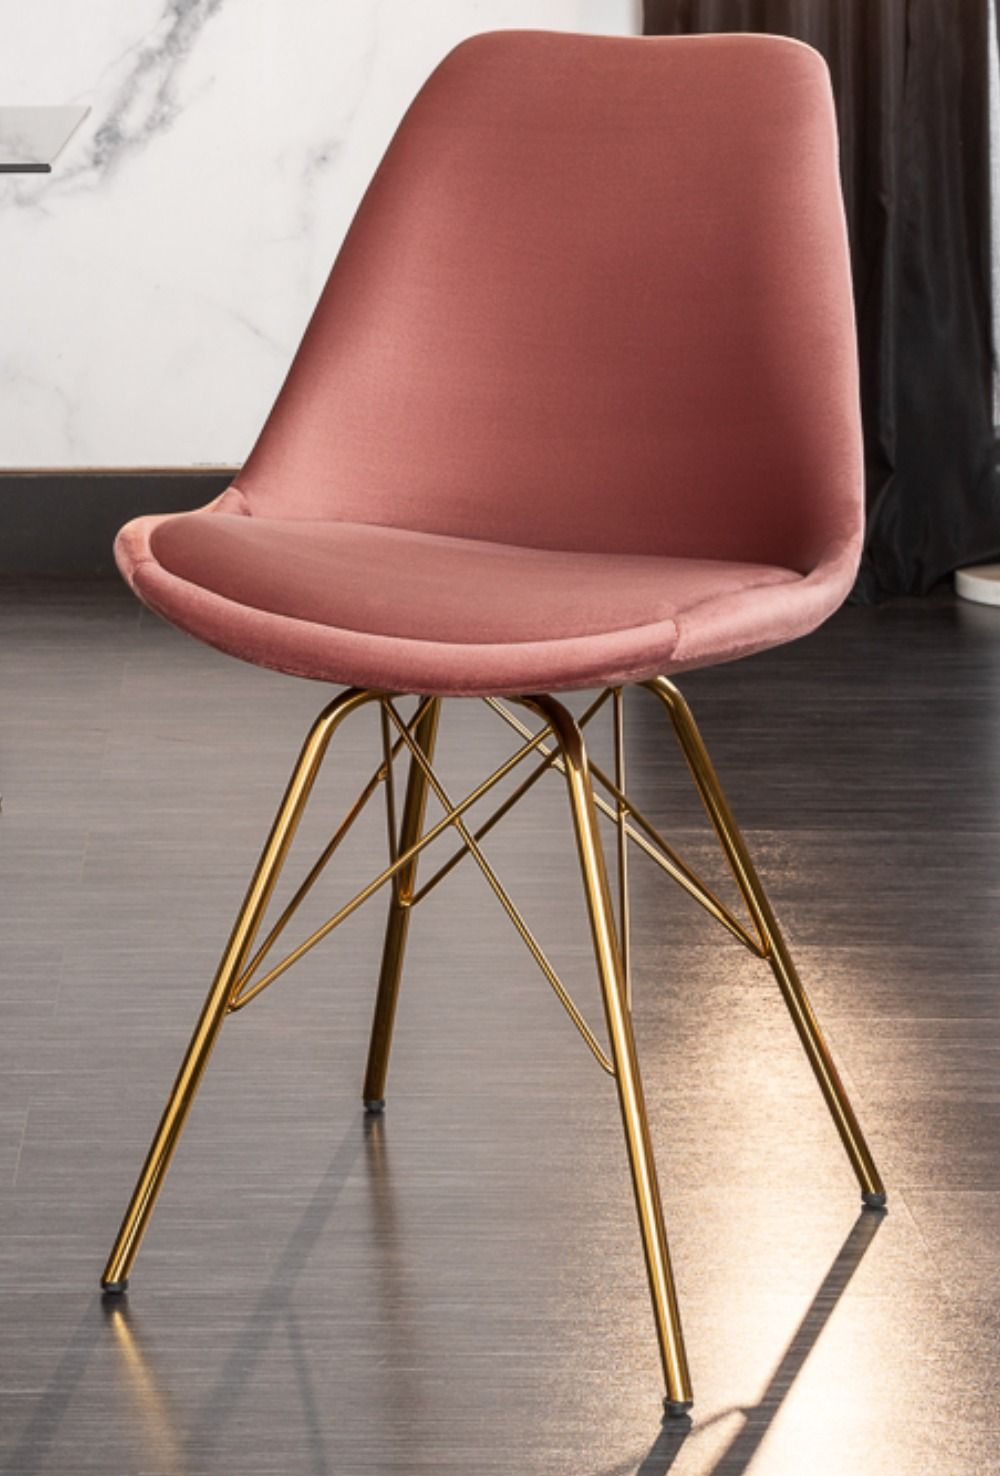 Design Stuhl Scandinavia Meisterstuck Samt Altrosa Goldene Beine Riess Ambiente De Stuhle Altrosa Meisterstuck